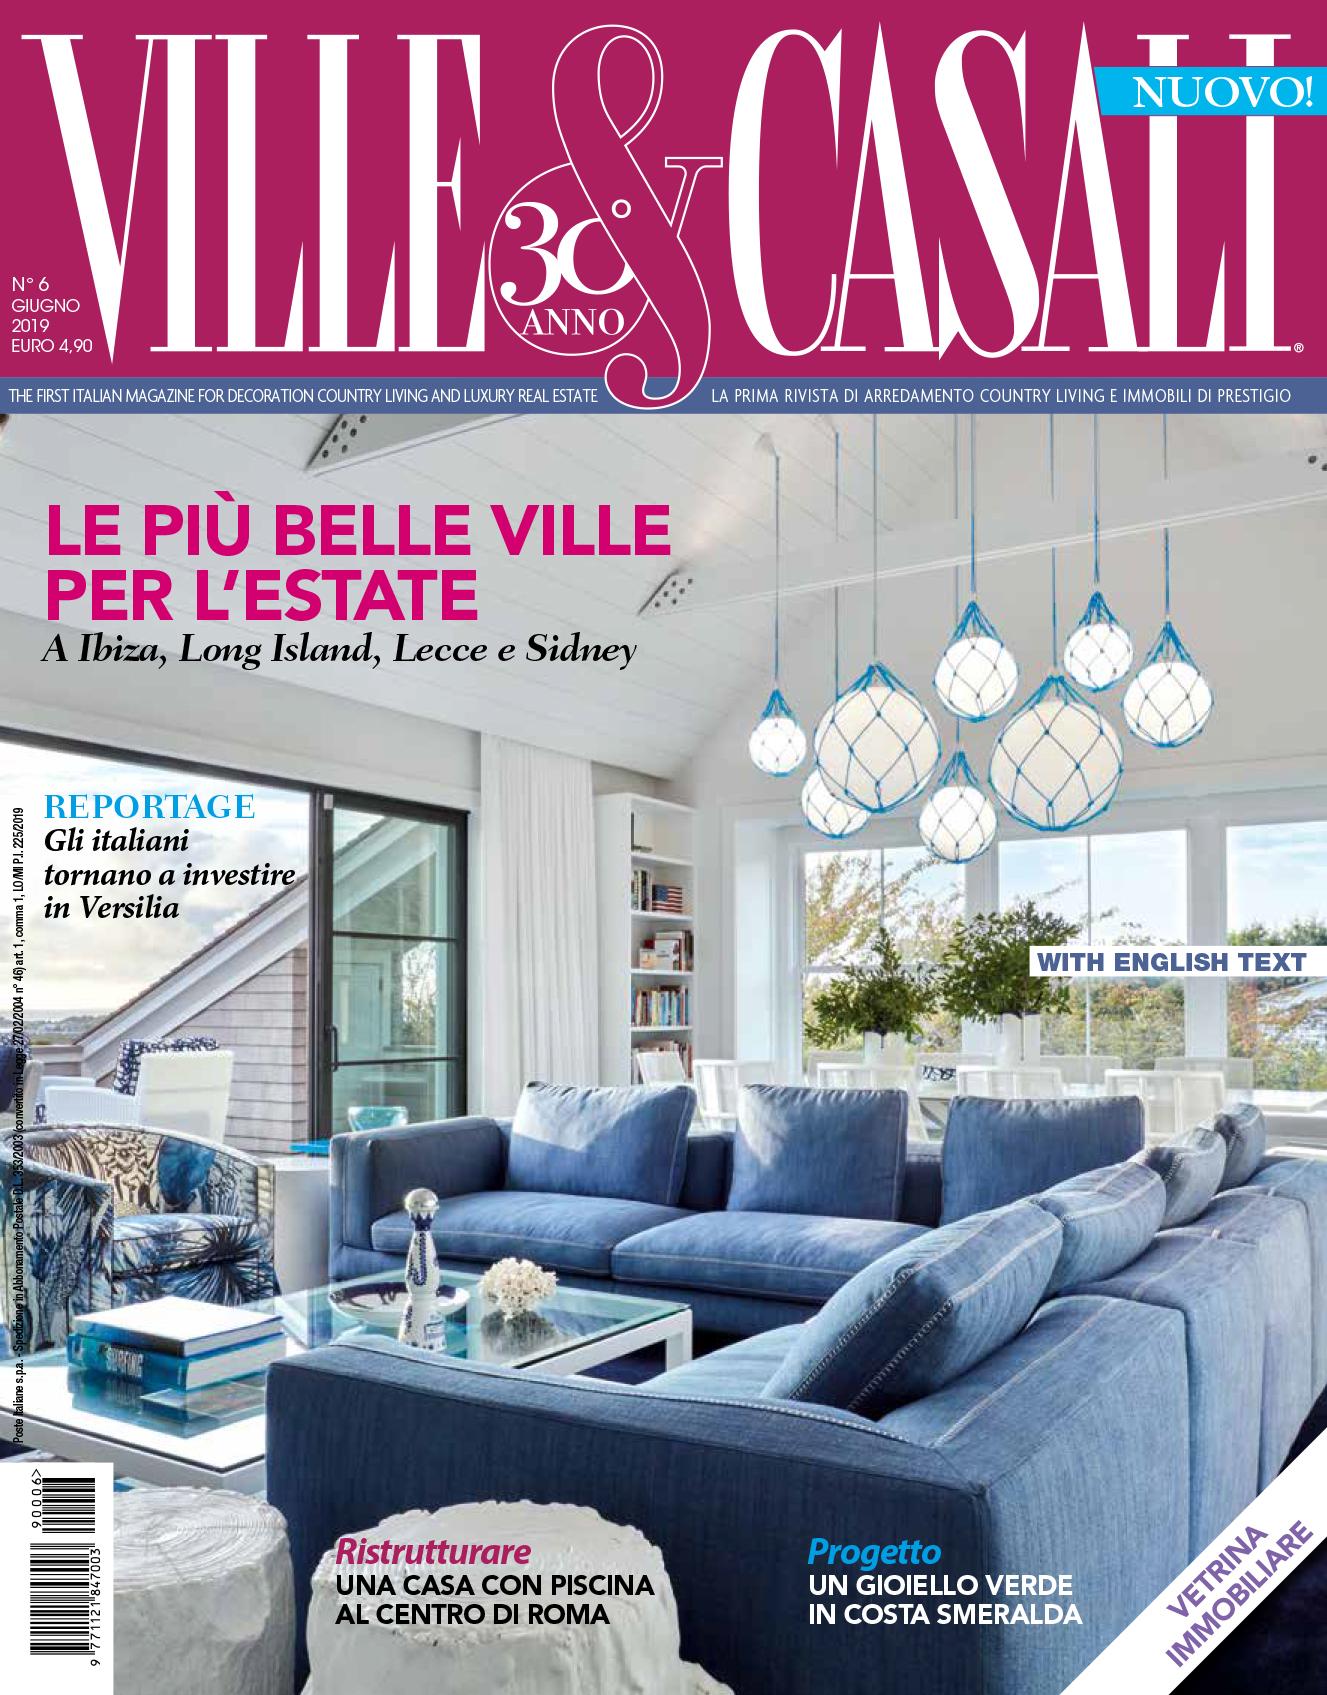 Arredamento Per Casali ghislaine viÑas — press gallery